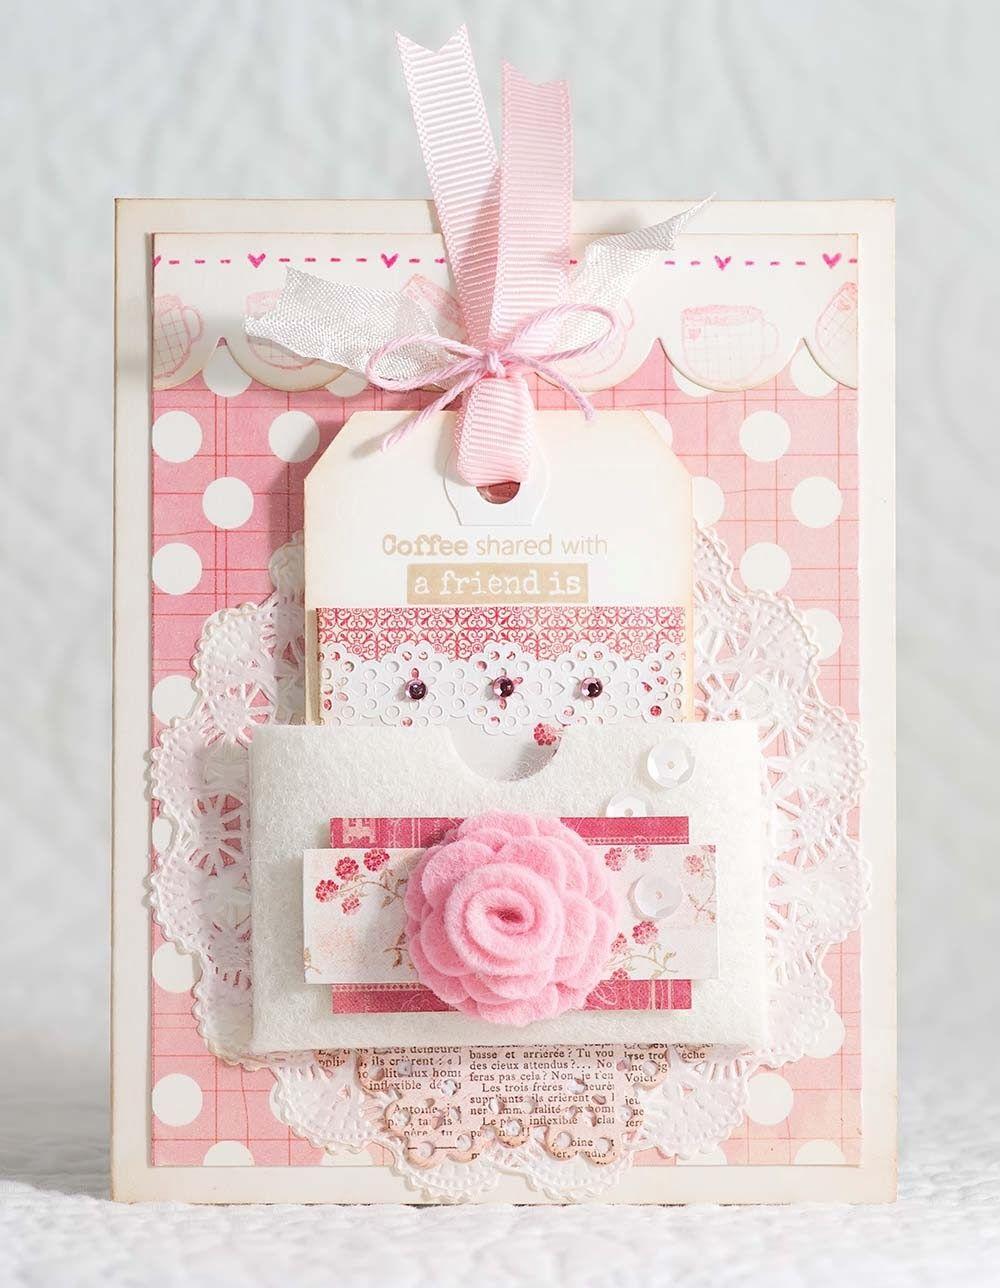 Tcc 3 Coffee Shared With Friends Beautiful Handmade Cards